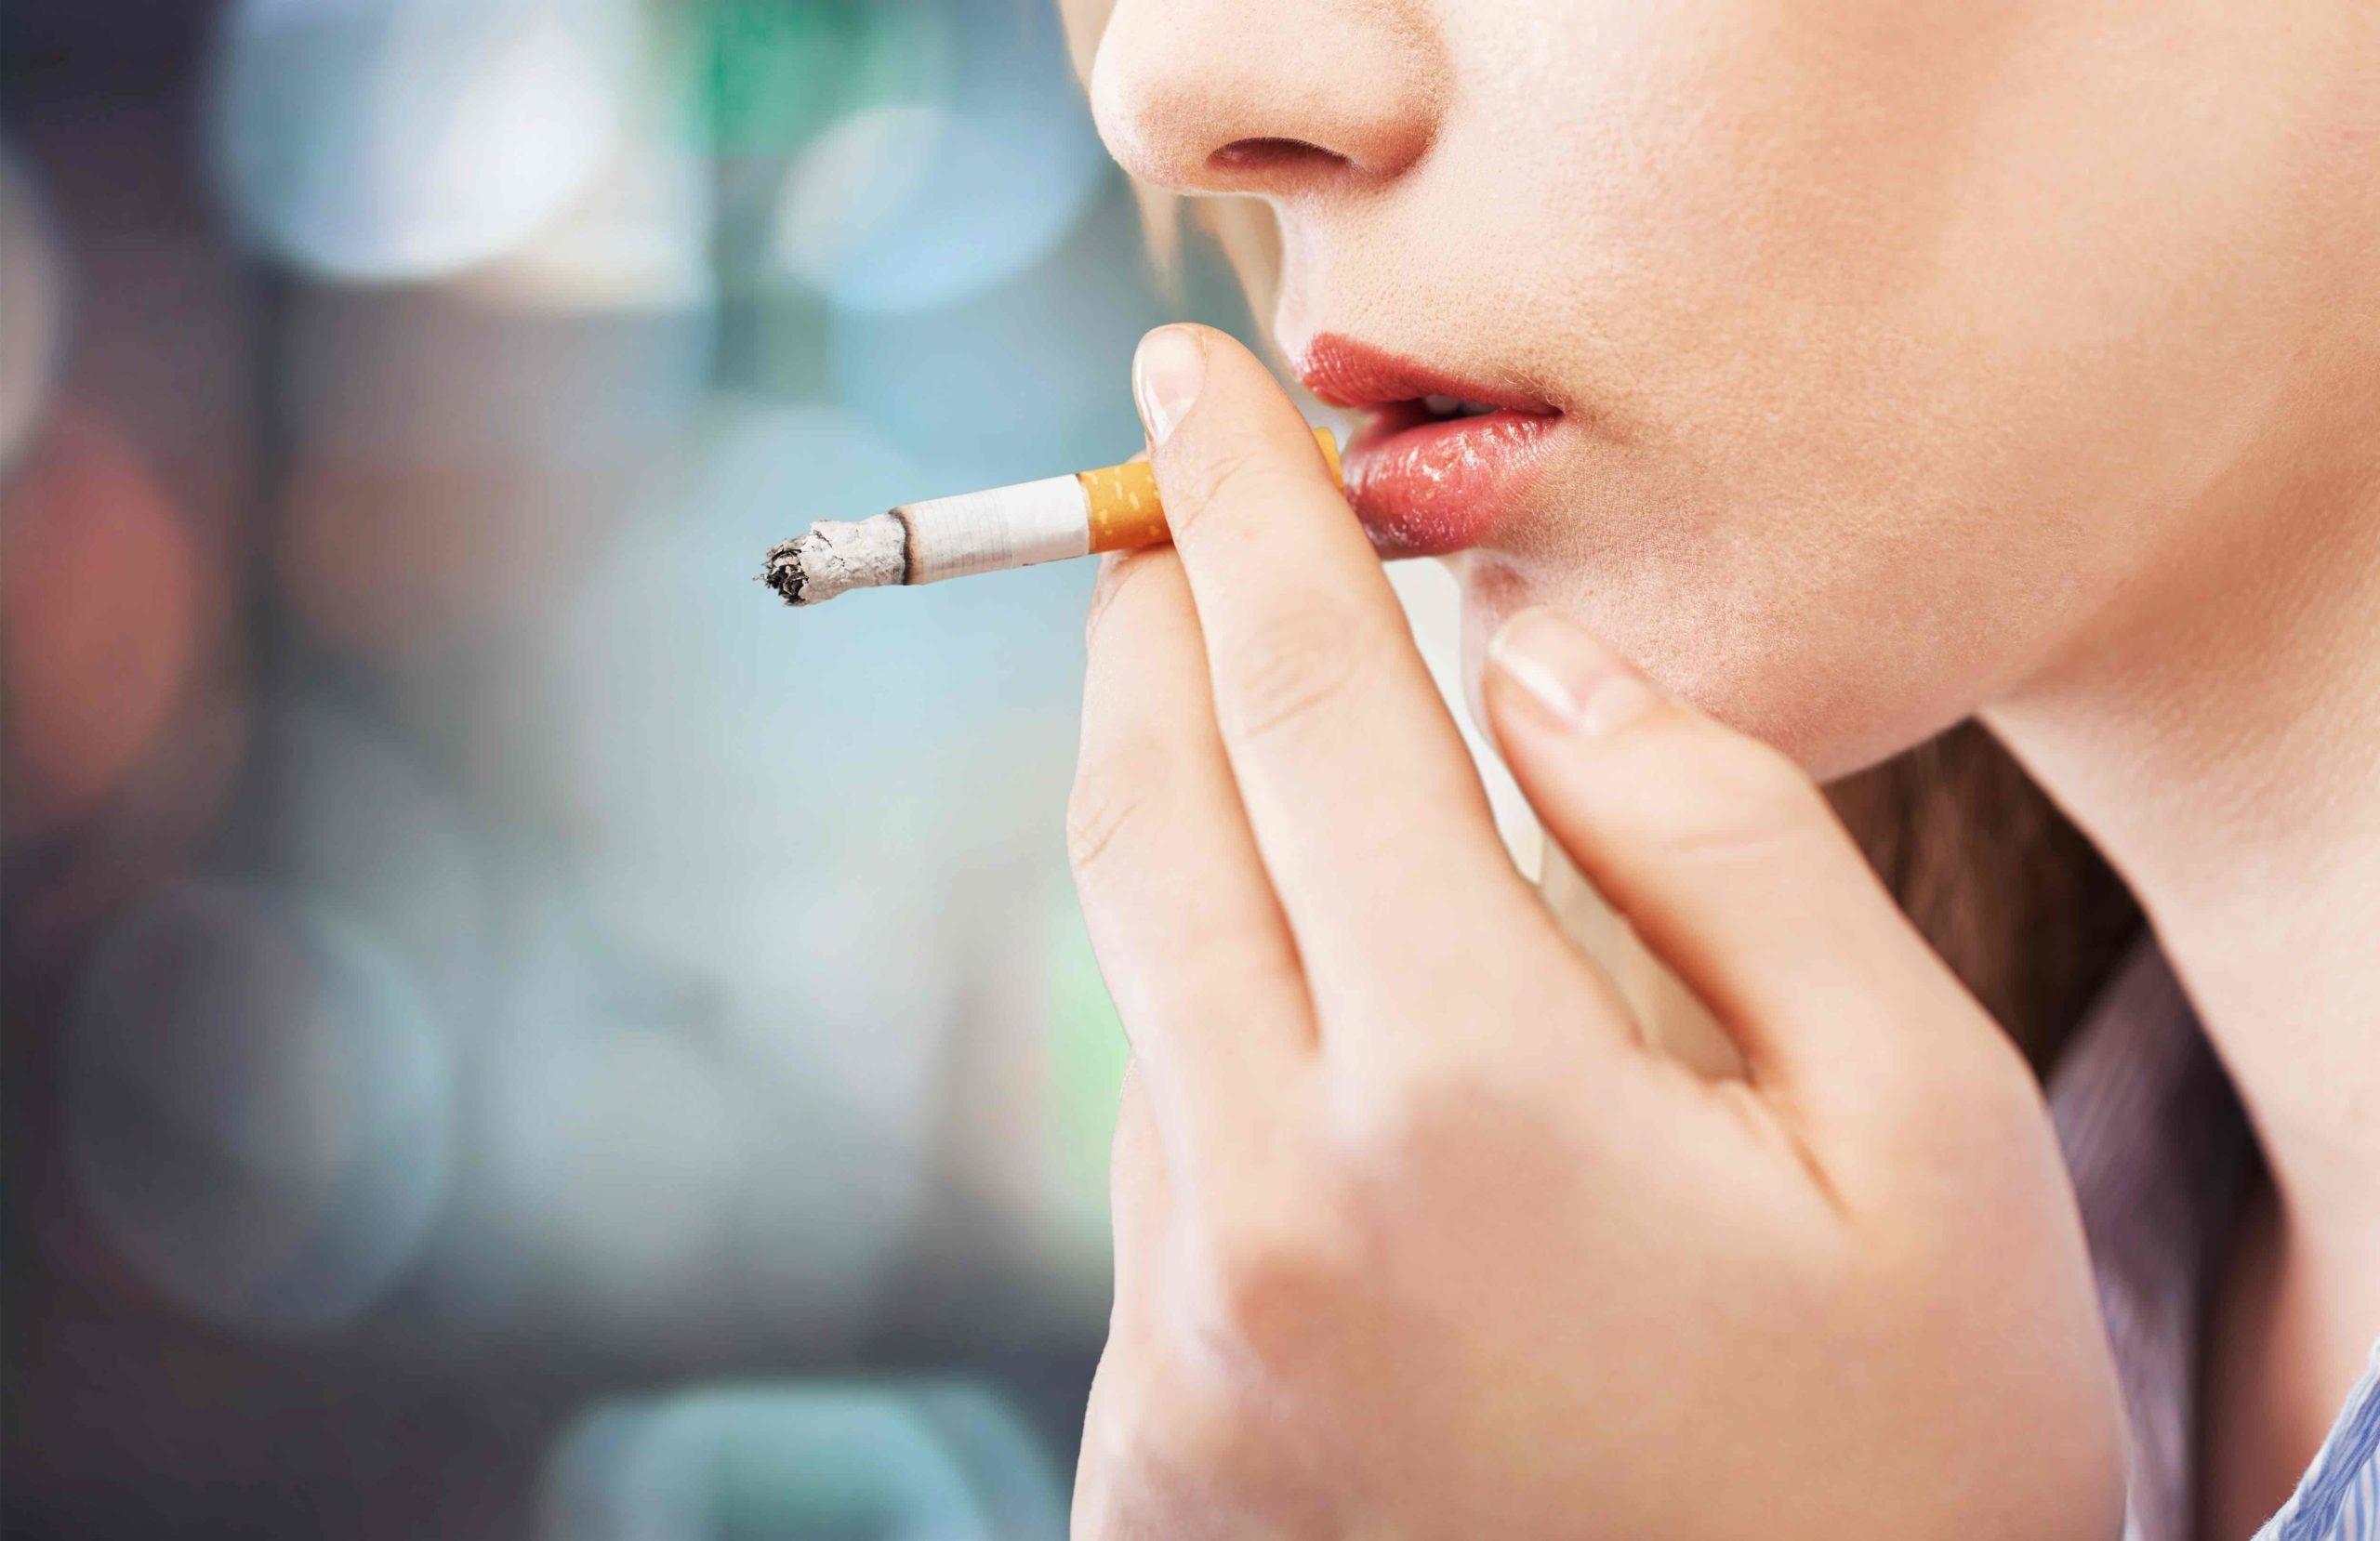 Le tabac en 10 questions